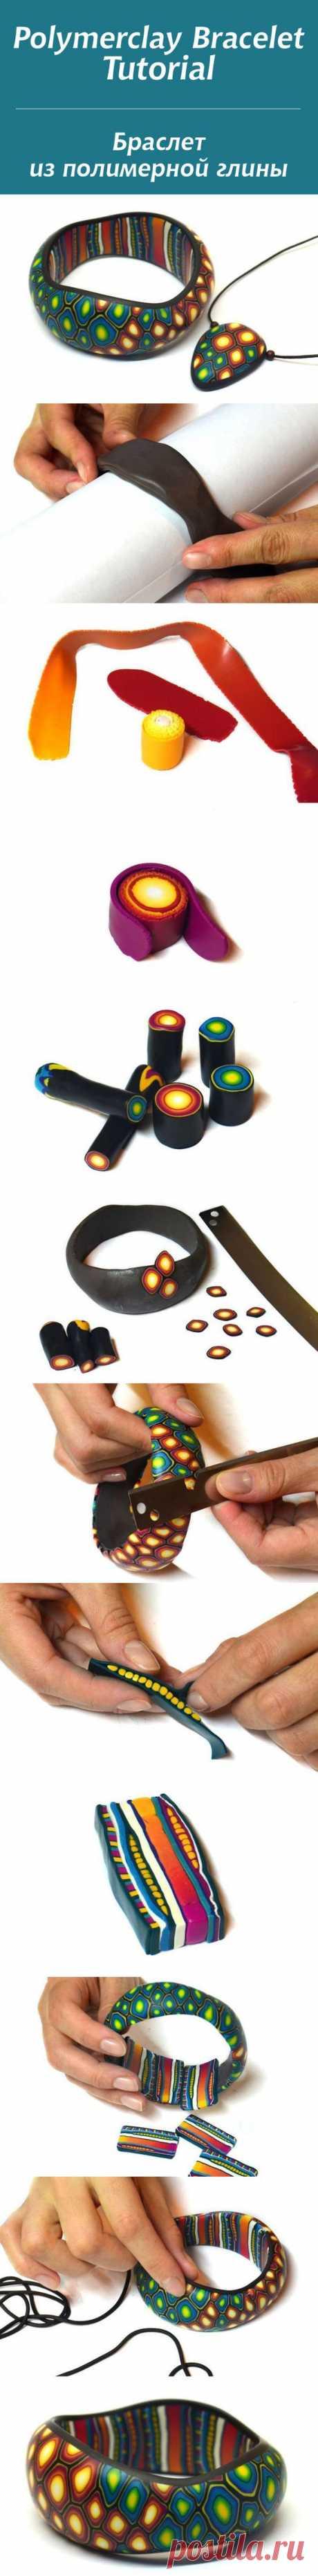 (11) FREE POLYMER CLAY TUTORIAL: Делаем красочный браслет из полимерной глины #polymerclay | Play with Clay